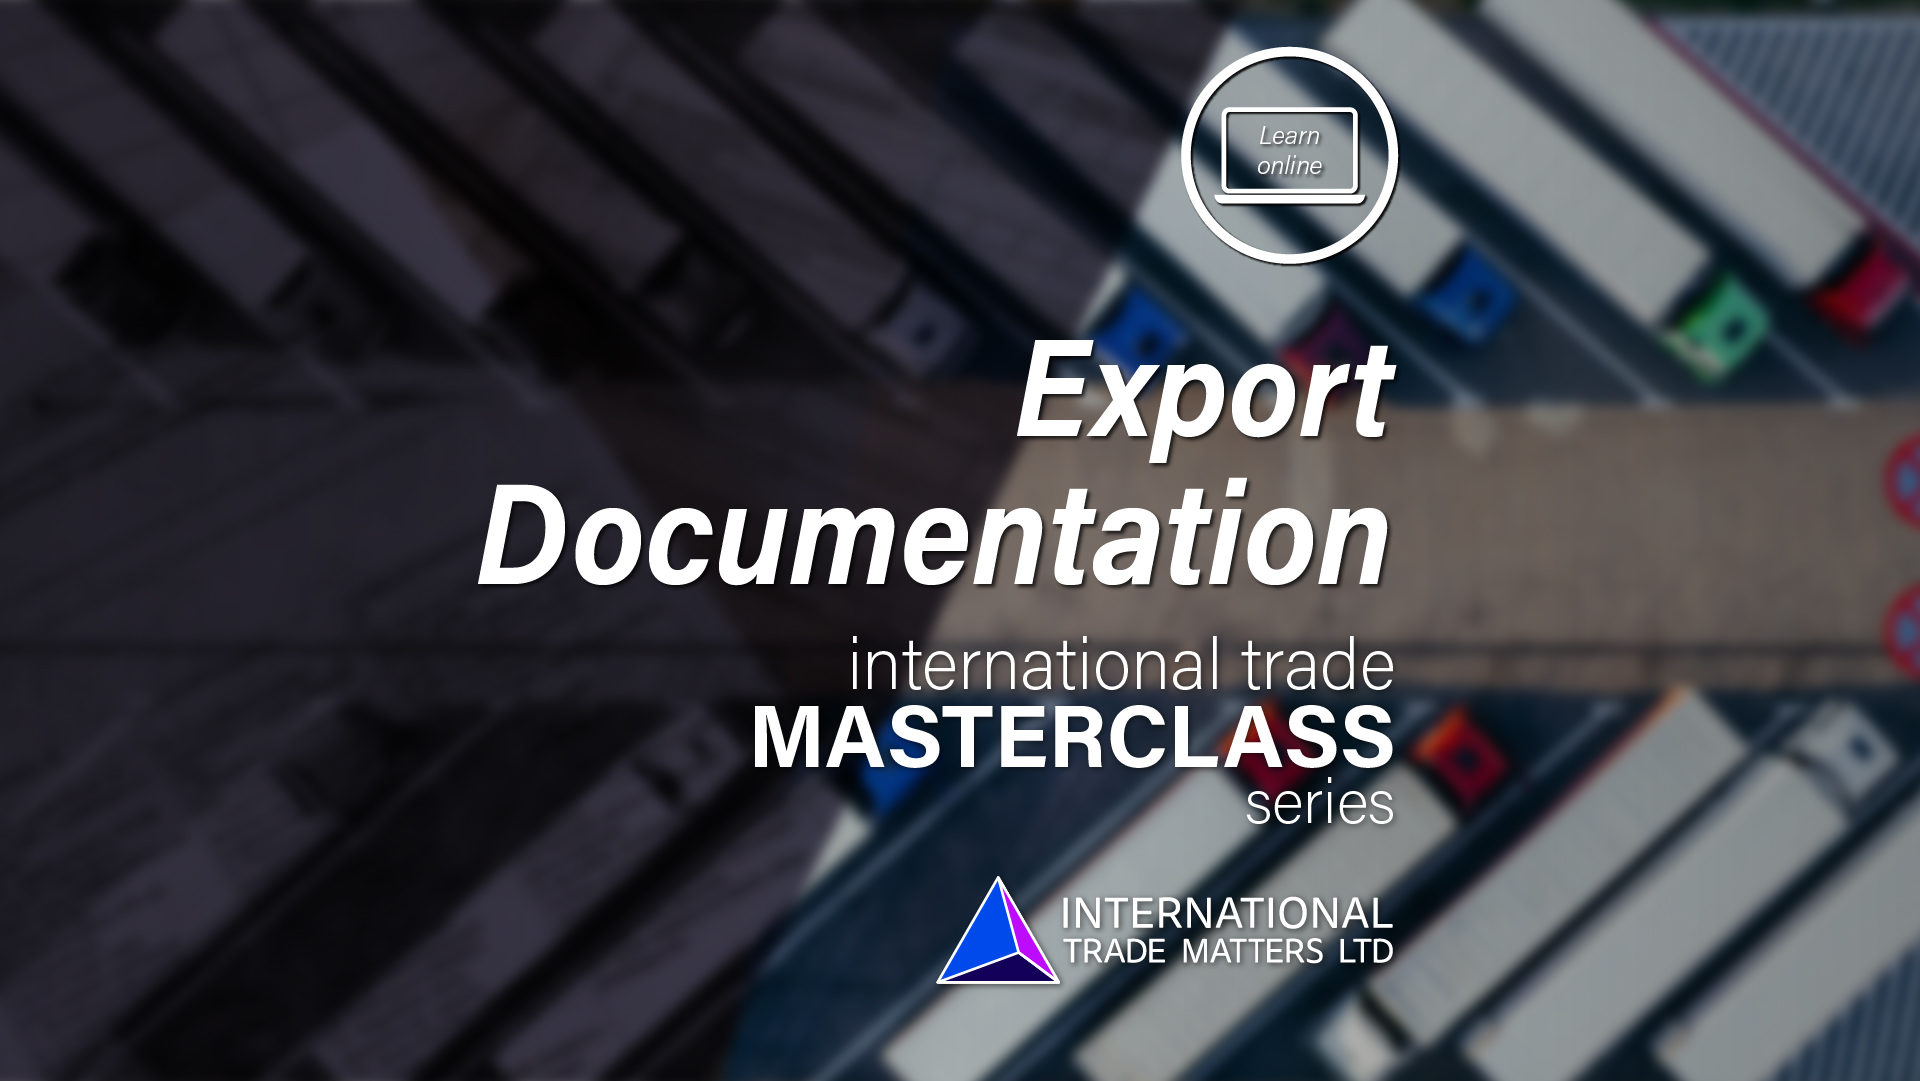 An International Trade Masterclass - Export Documentation